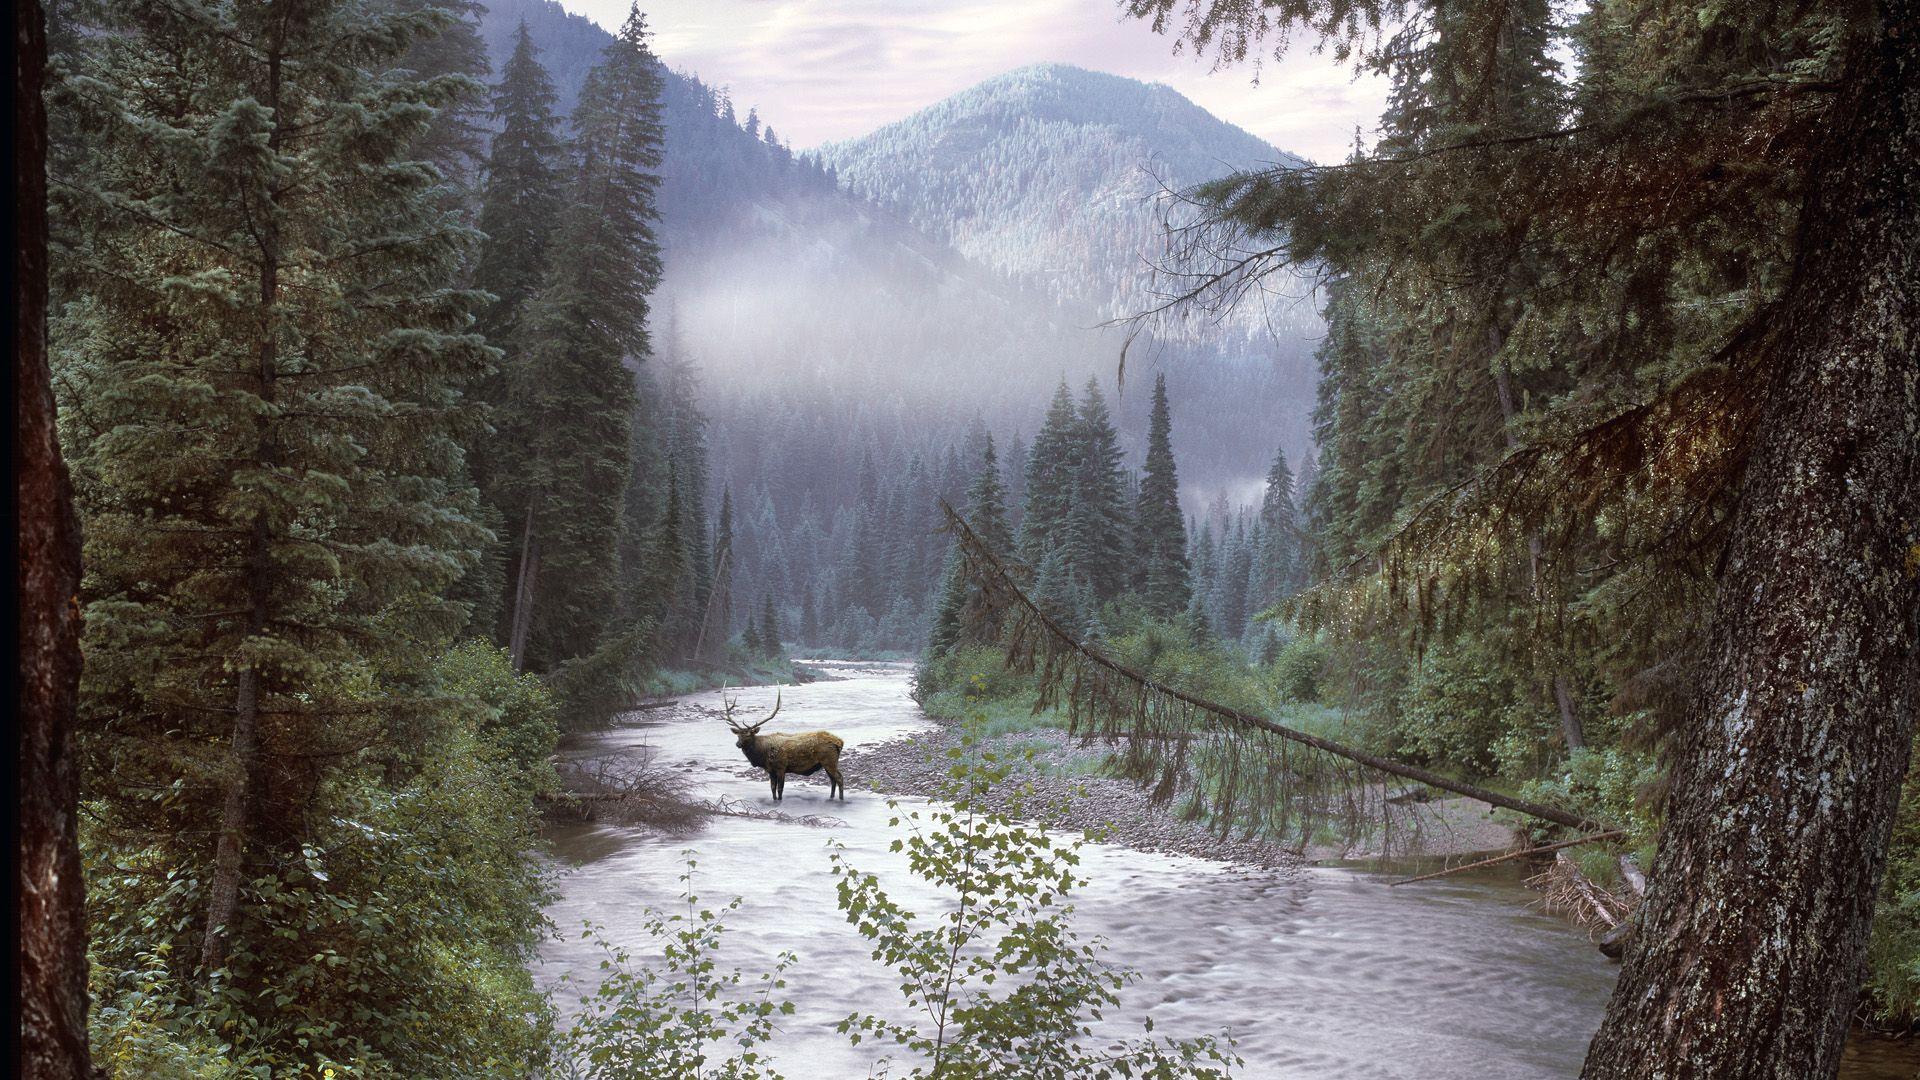 Free Fall Bc Nature Wallpaper Elk Selway Bitterroot Wilderness Idaho Animal Planet